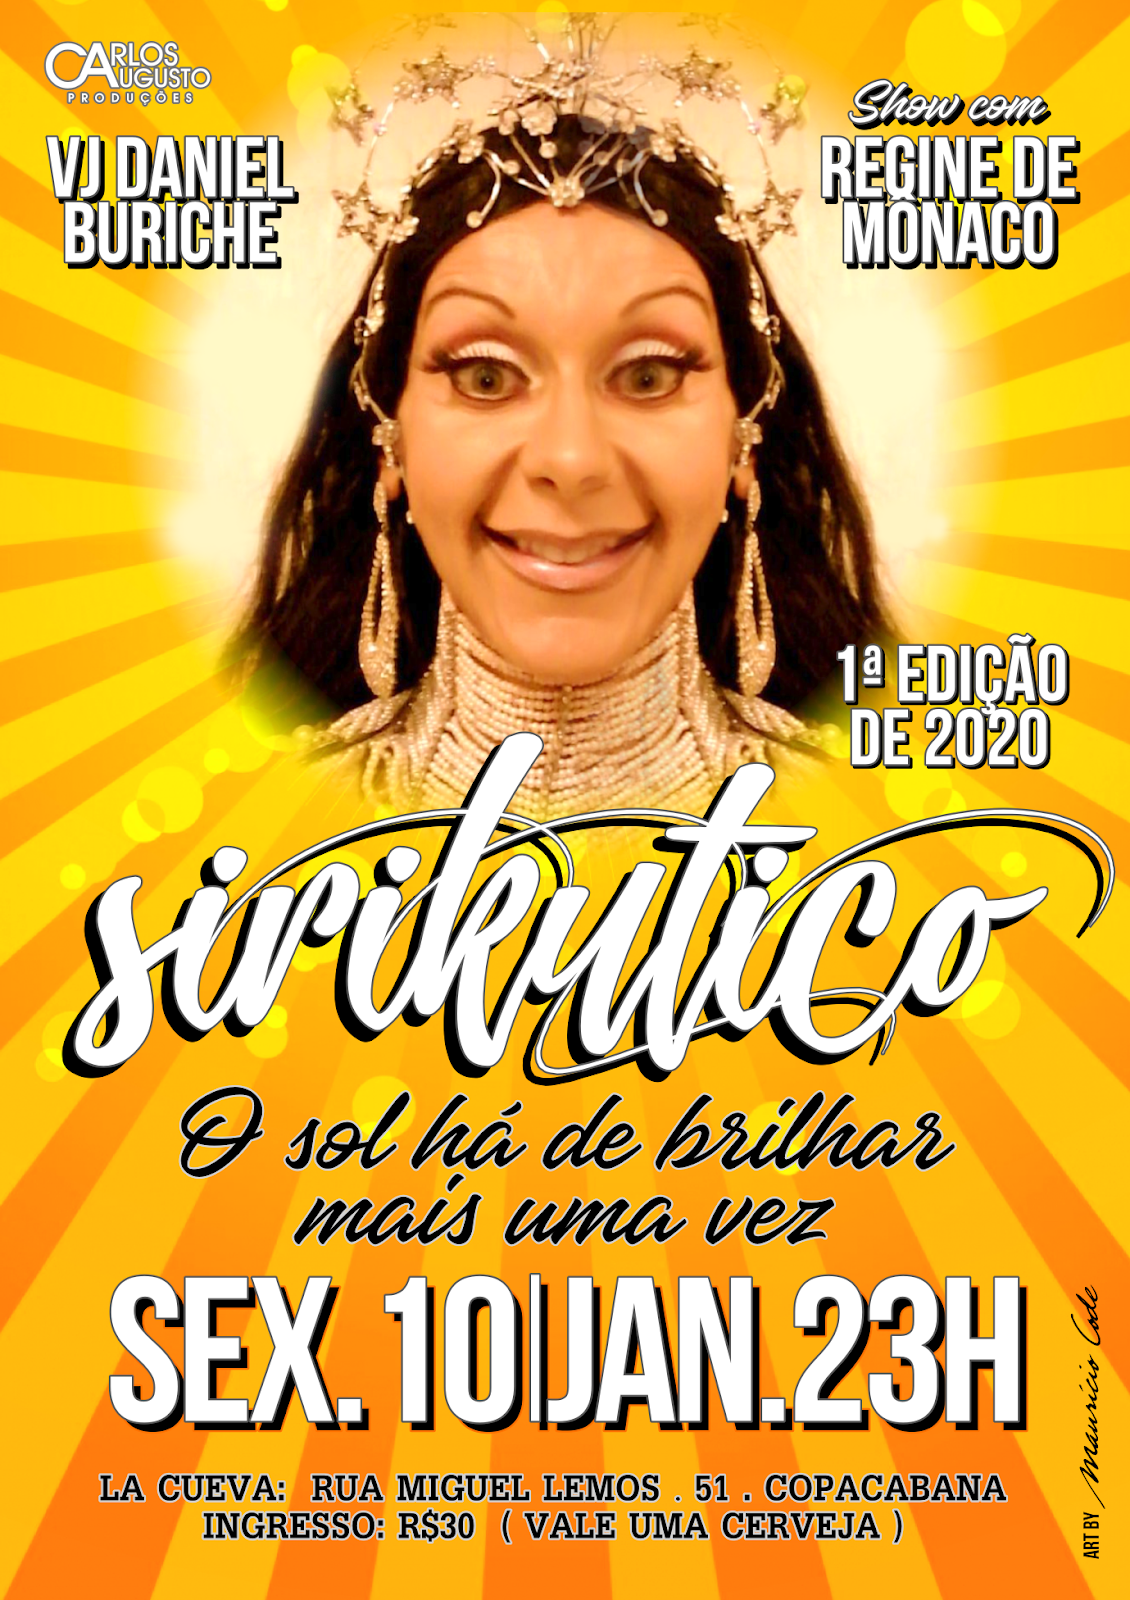 SEXTA - 10/01 - 23H